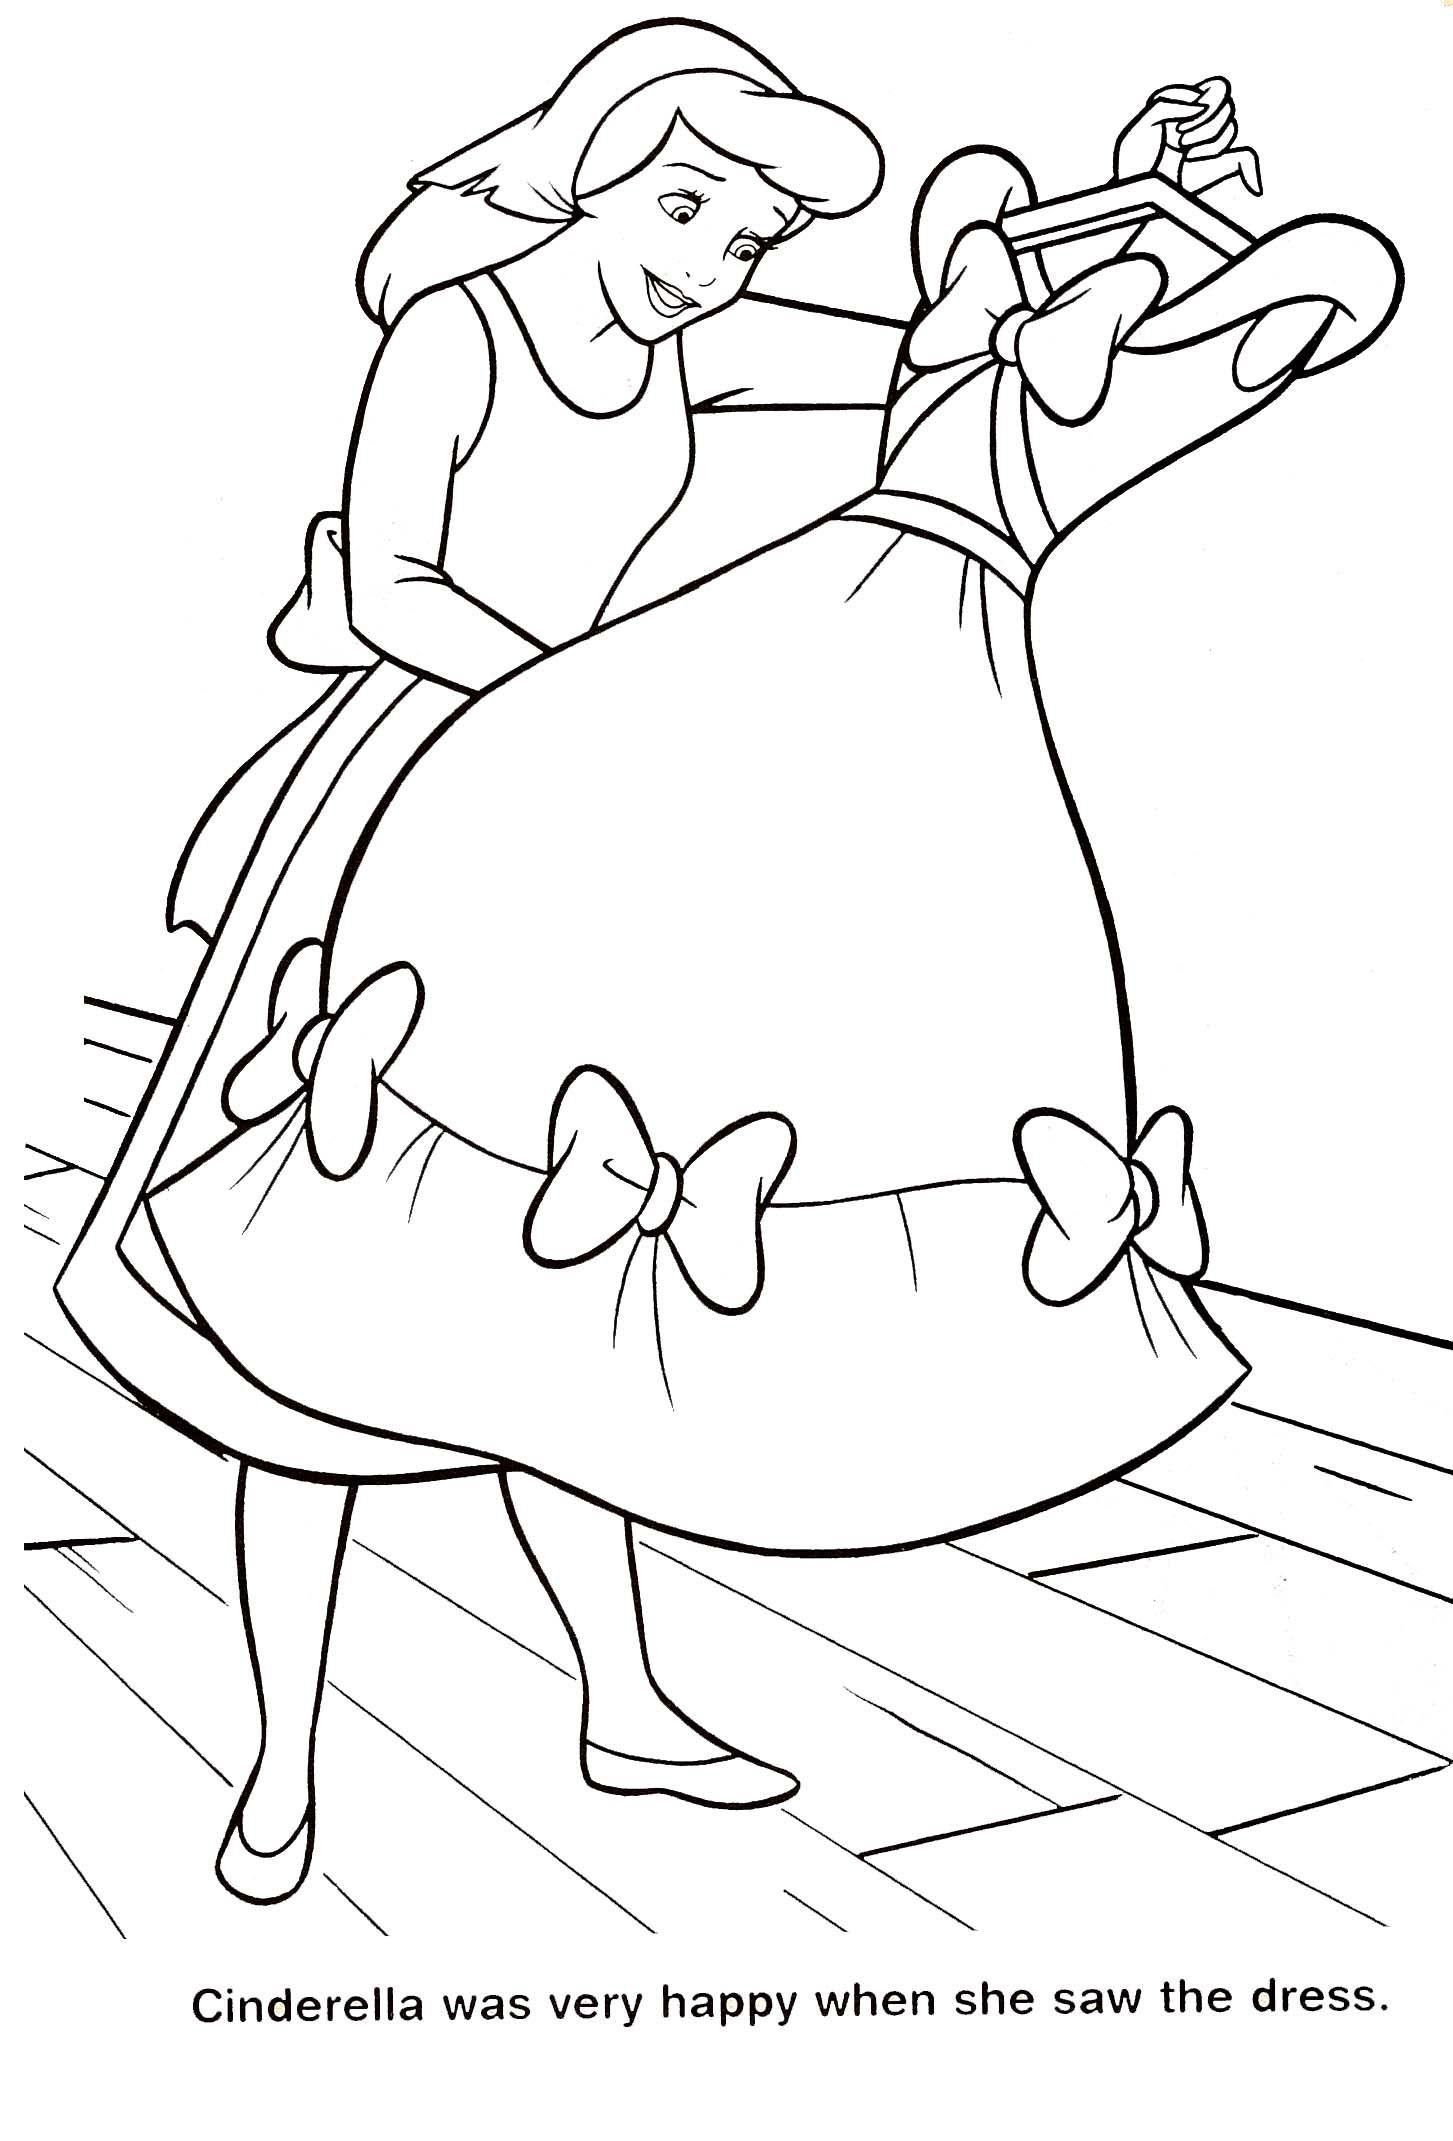 Pin By Kae N On Coloring Free Disney Coloring Pages Princess Coloring Pages Disney Coloring Pages